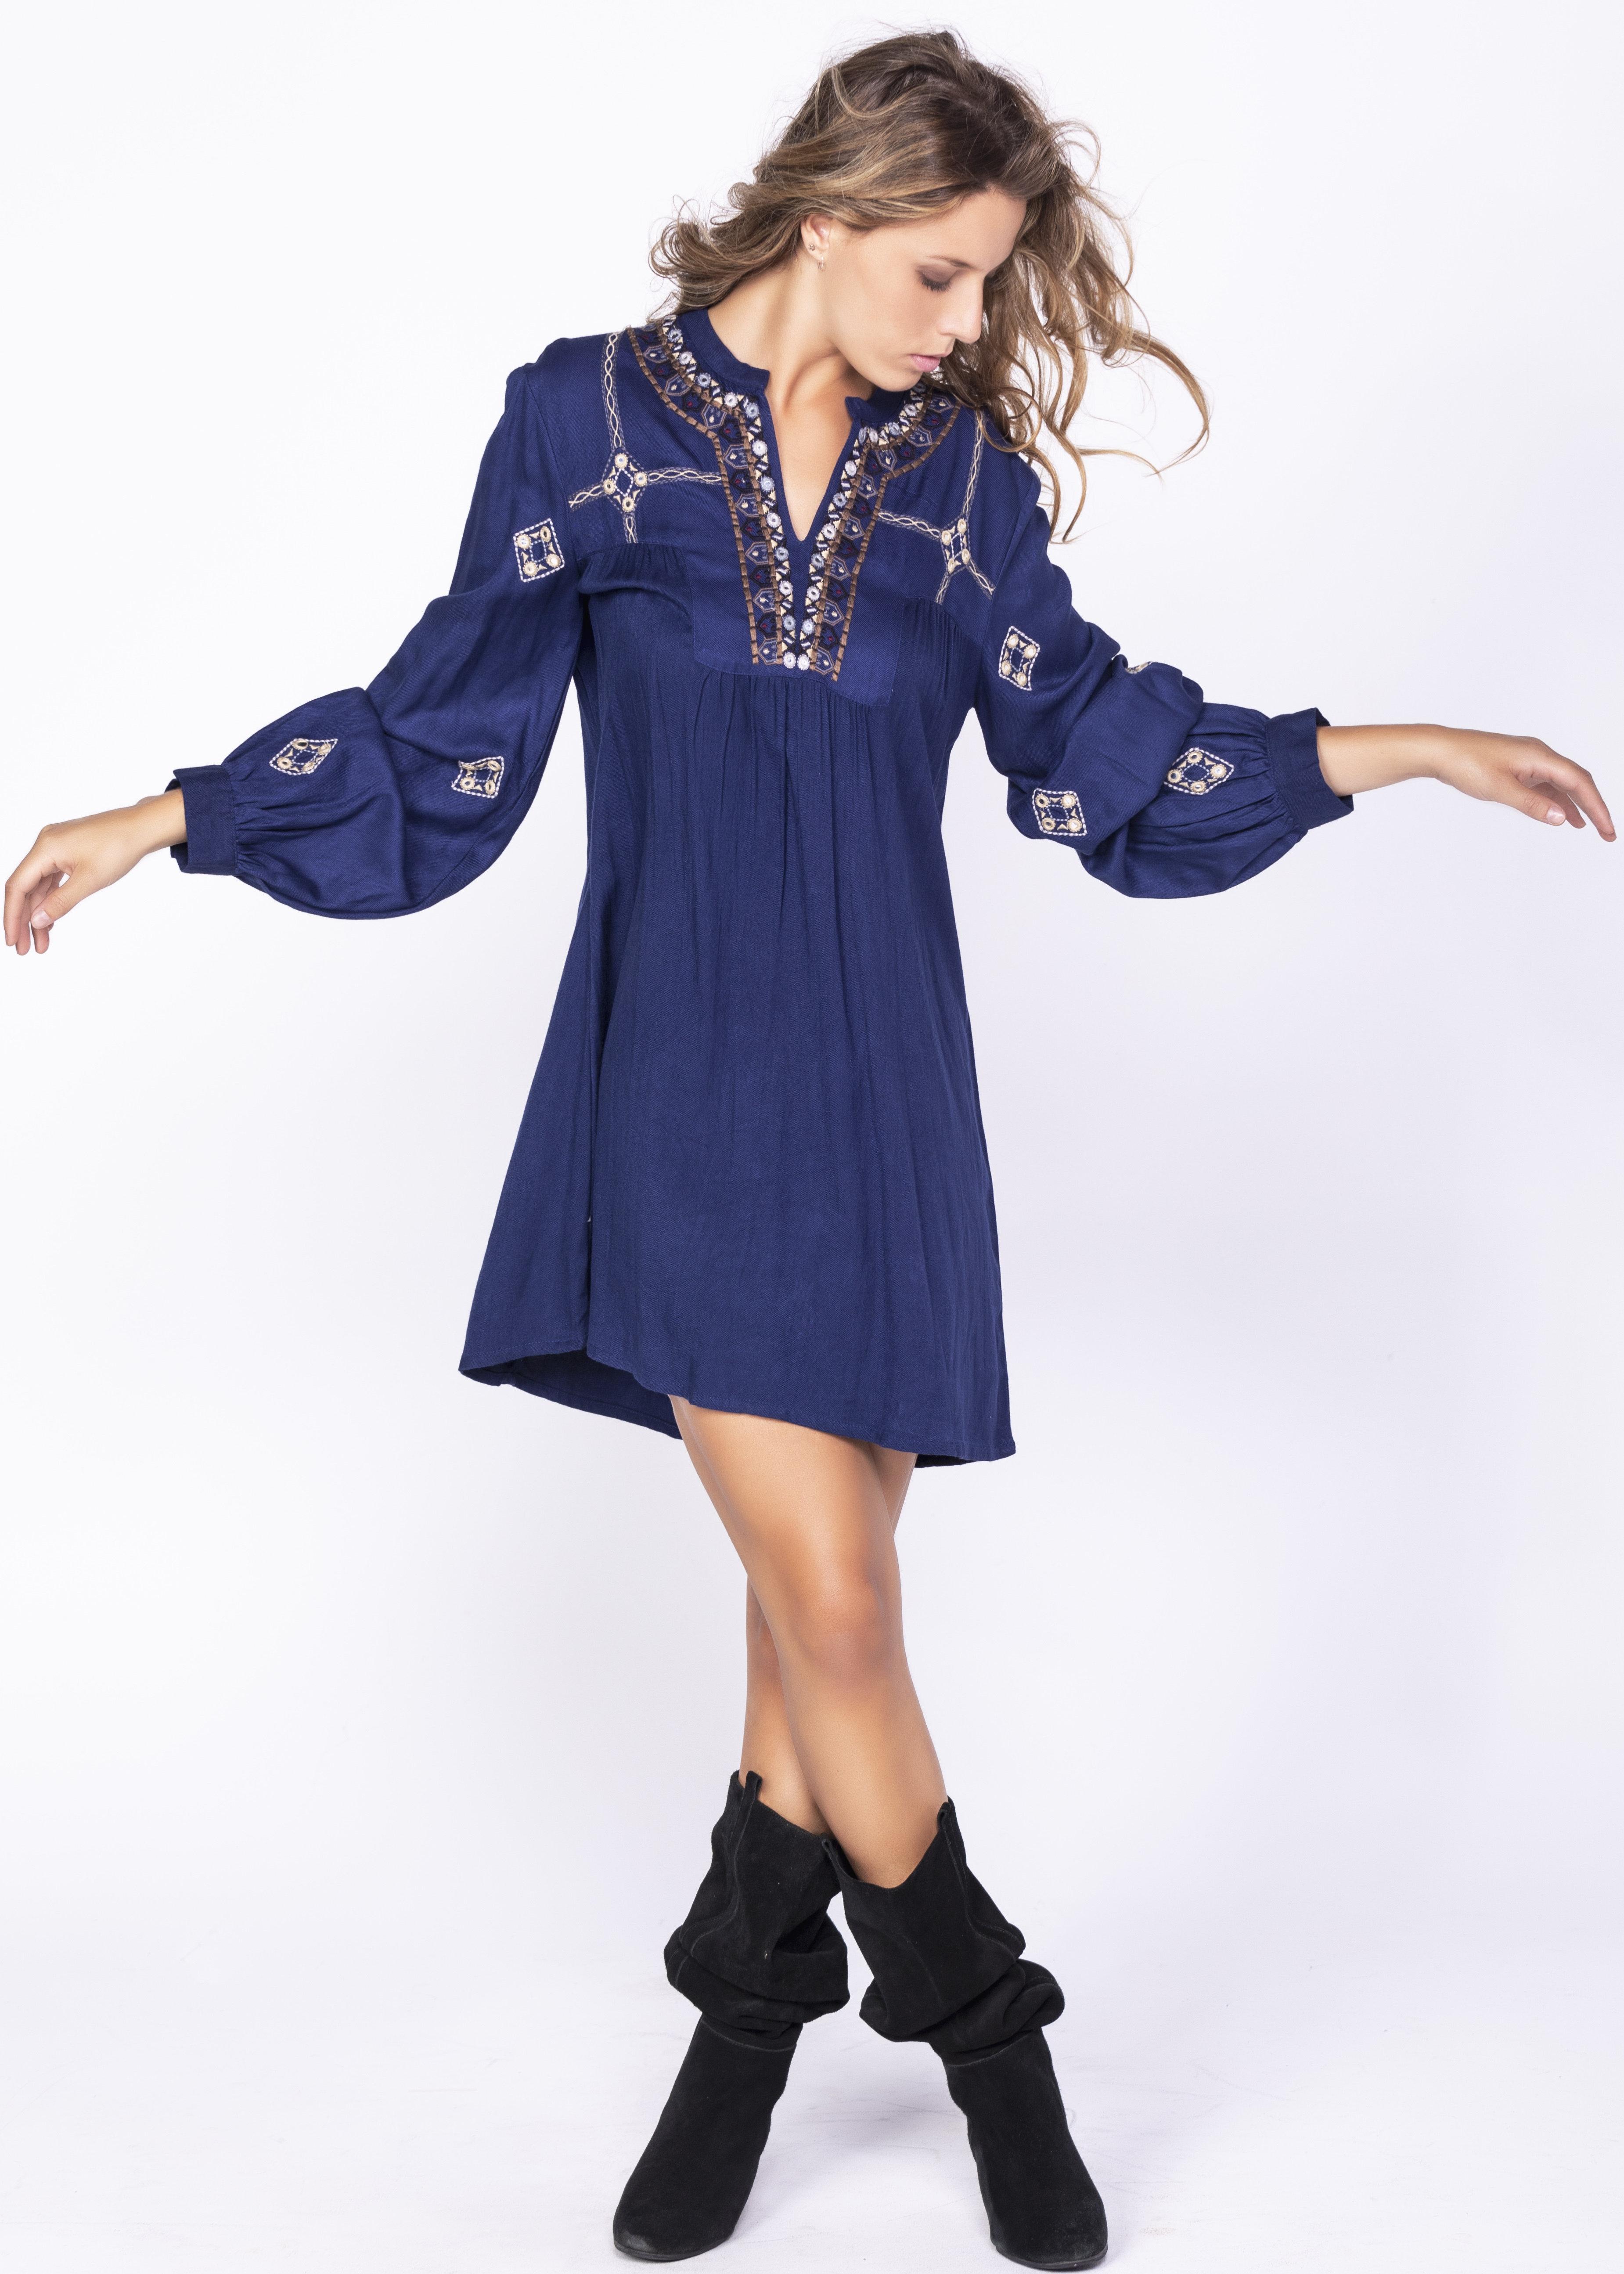 Savage Culture: Little Blue Empire Dress Gomti SAVAGE_35621